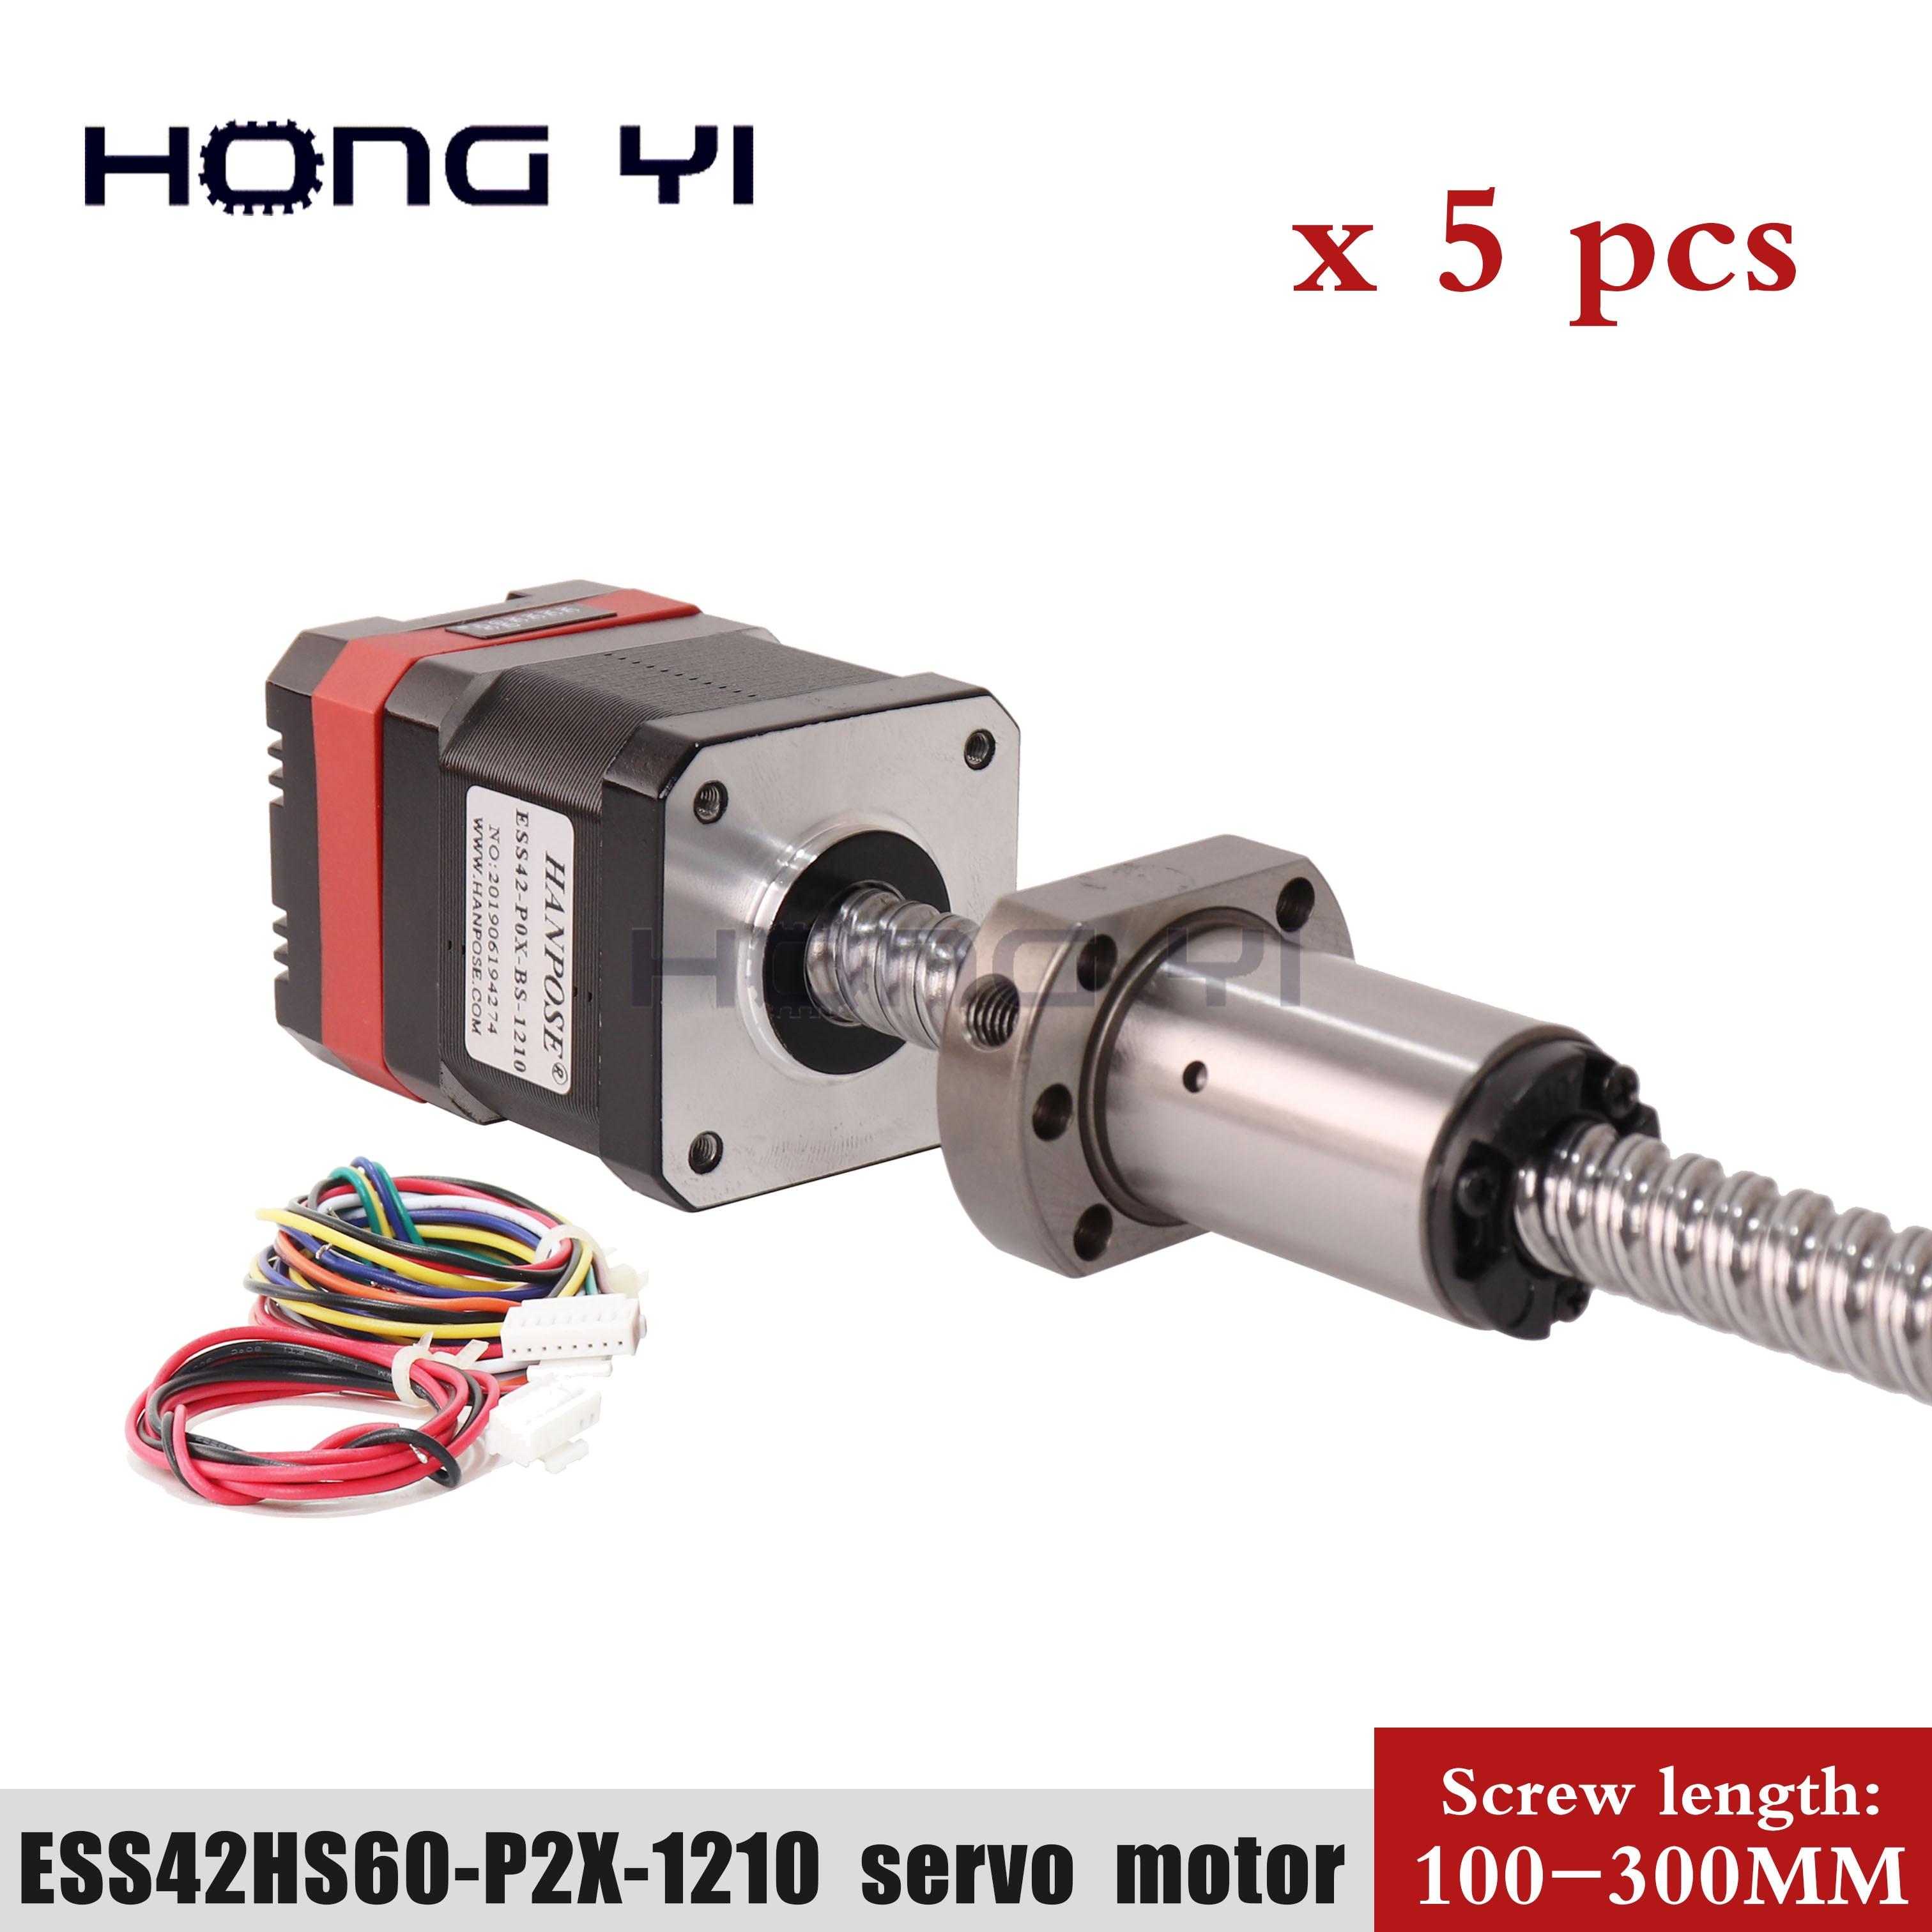 5pcs high torque ball screw motor 42hs60-p2x-sfu1210 servo stepping motor + drive combination 1.8A closed-loop motor